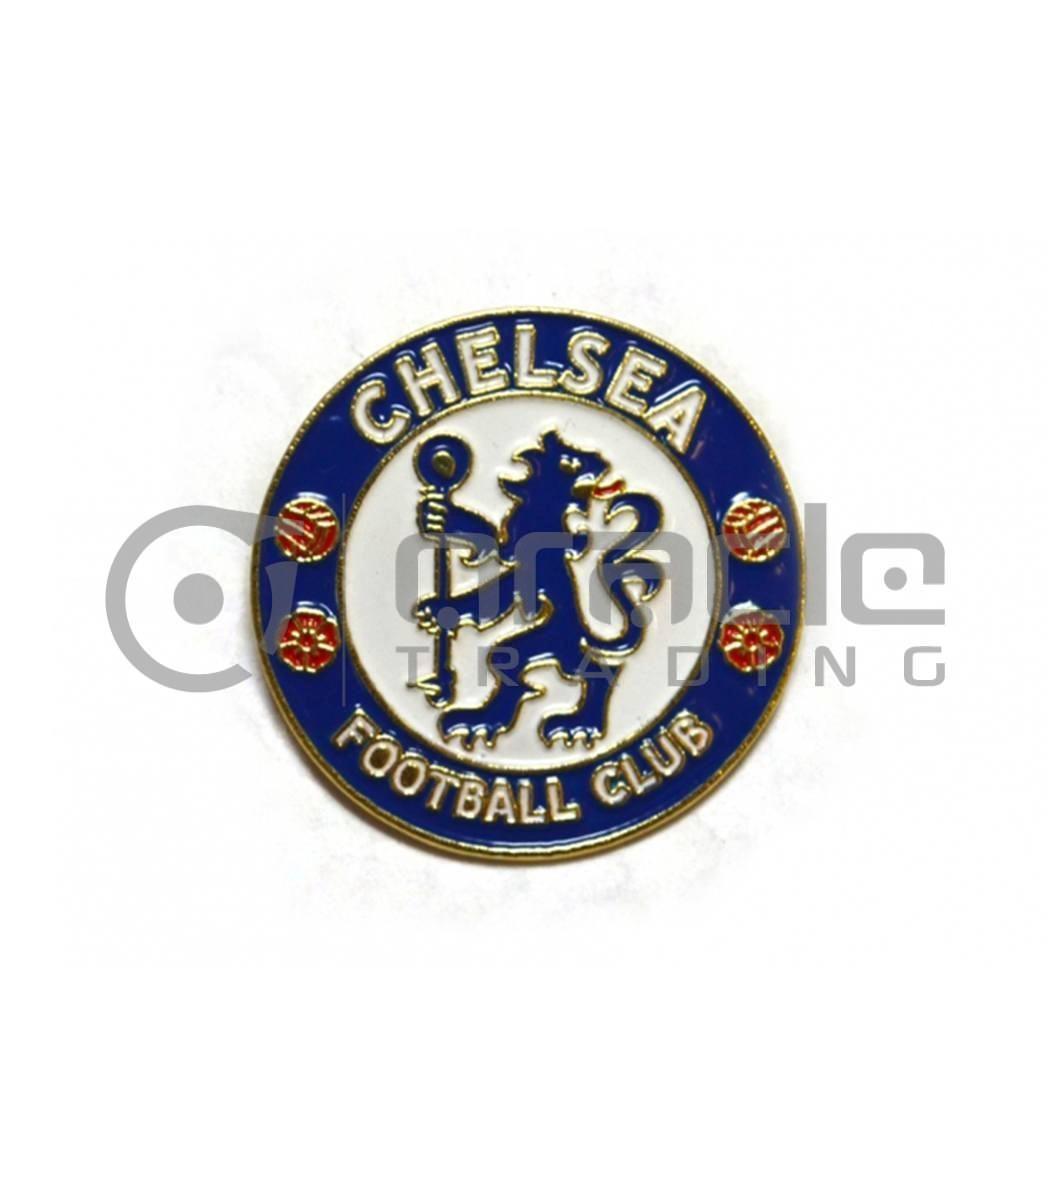 Chelsea Crest Pin